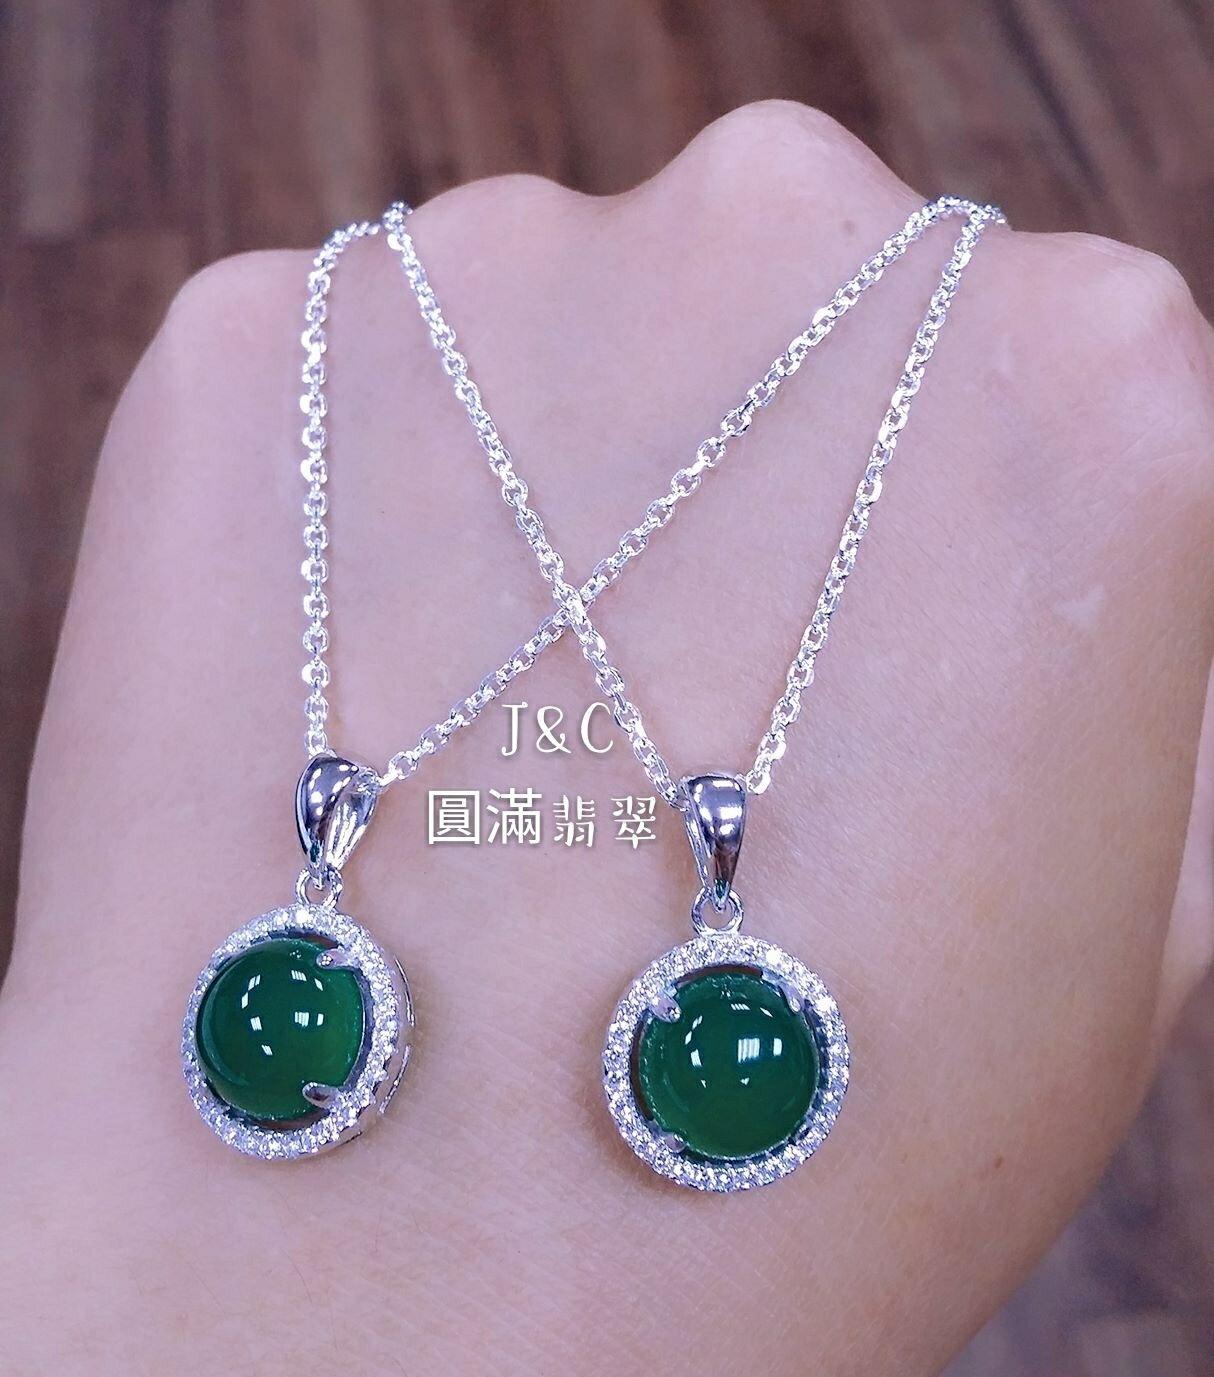 【Q呢代購】香港正生銀飾~圓滿翡翠項鍊  預購